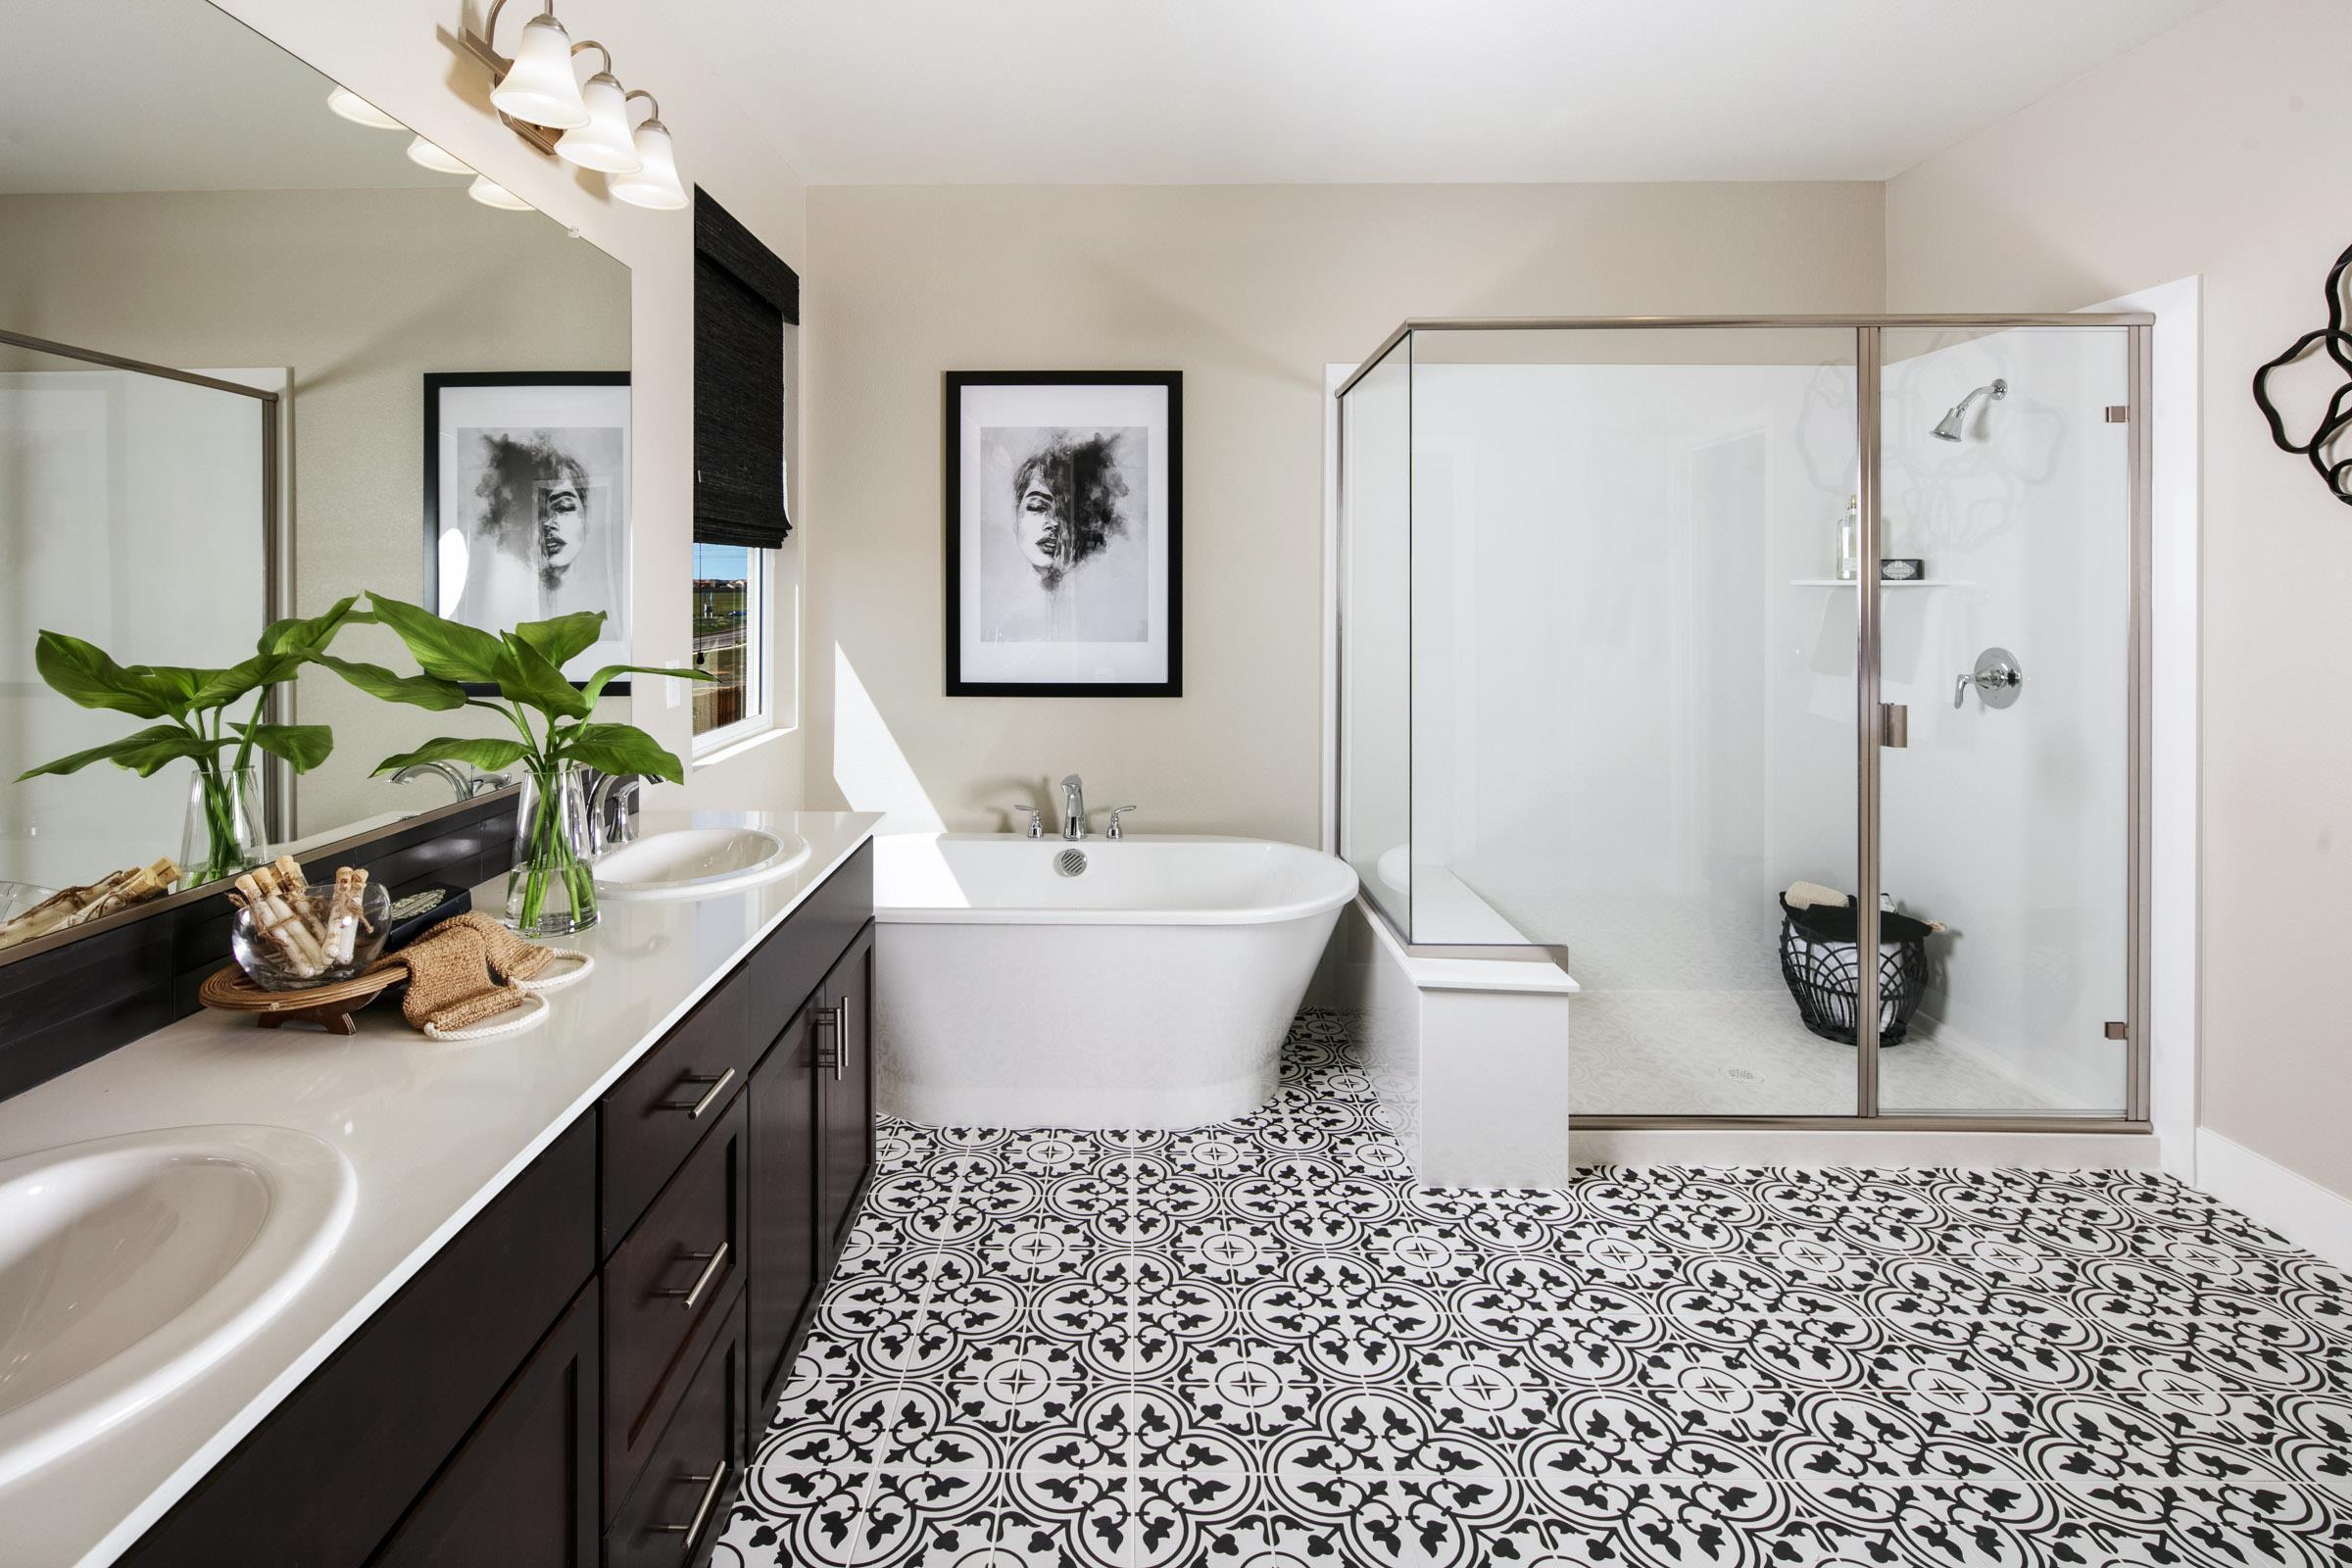 Bathroom featured in the Plan 3 By Watt Communities in Sacramento, CA